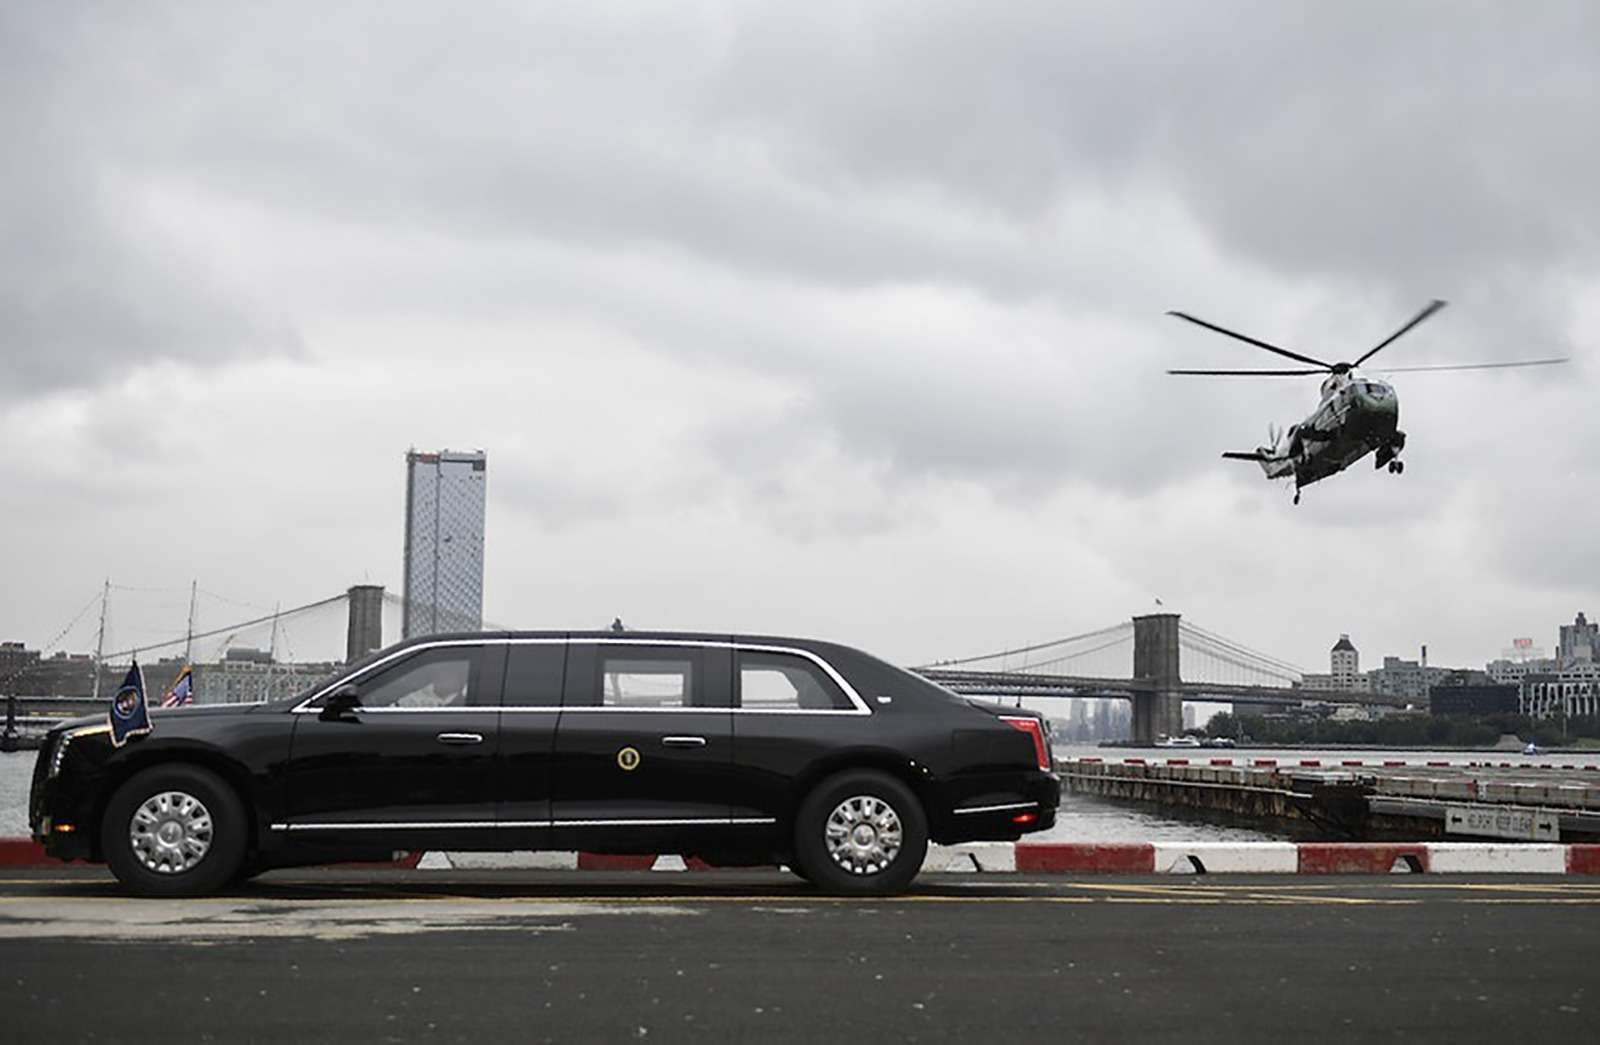 5 фактов оновом лимузине Дональда Трампа. Круче ли онАуруса Путина?— фото 907874